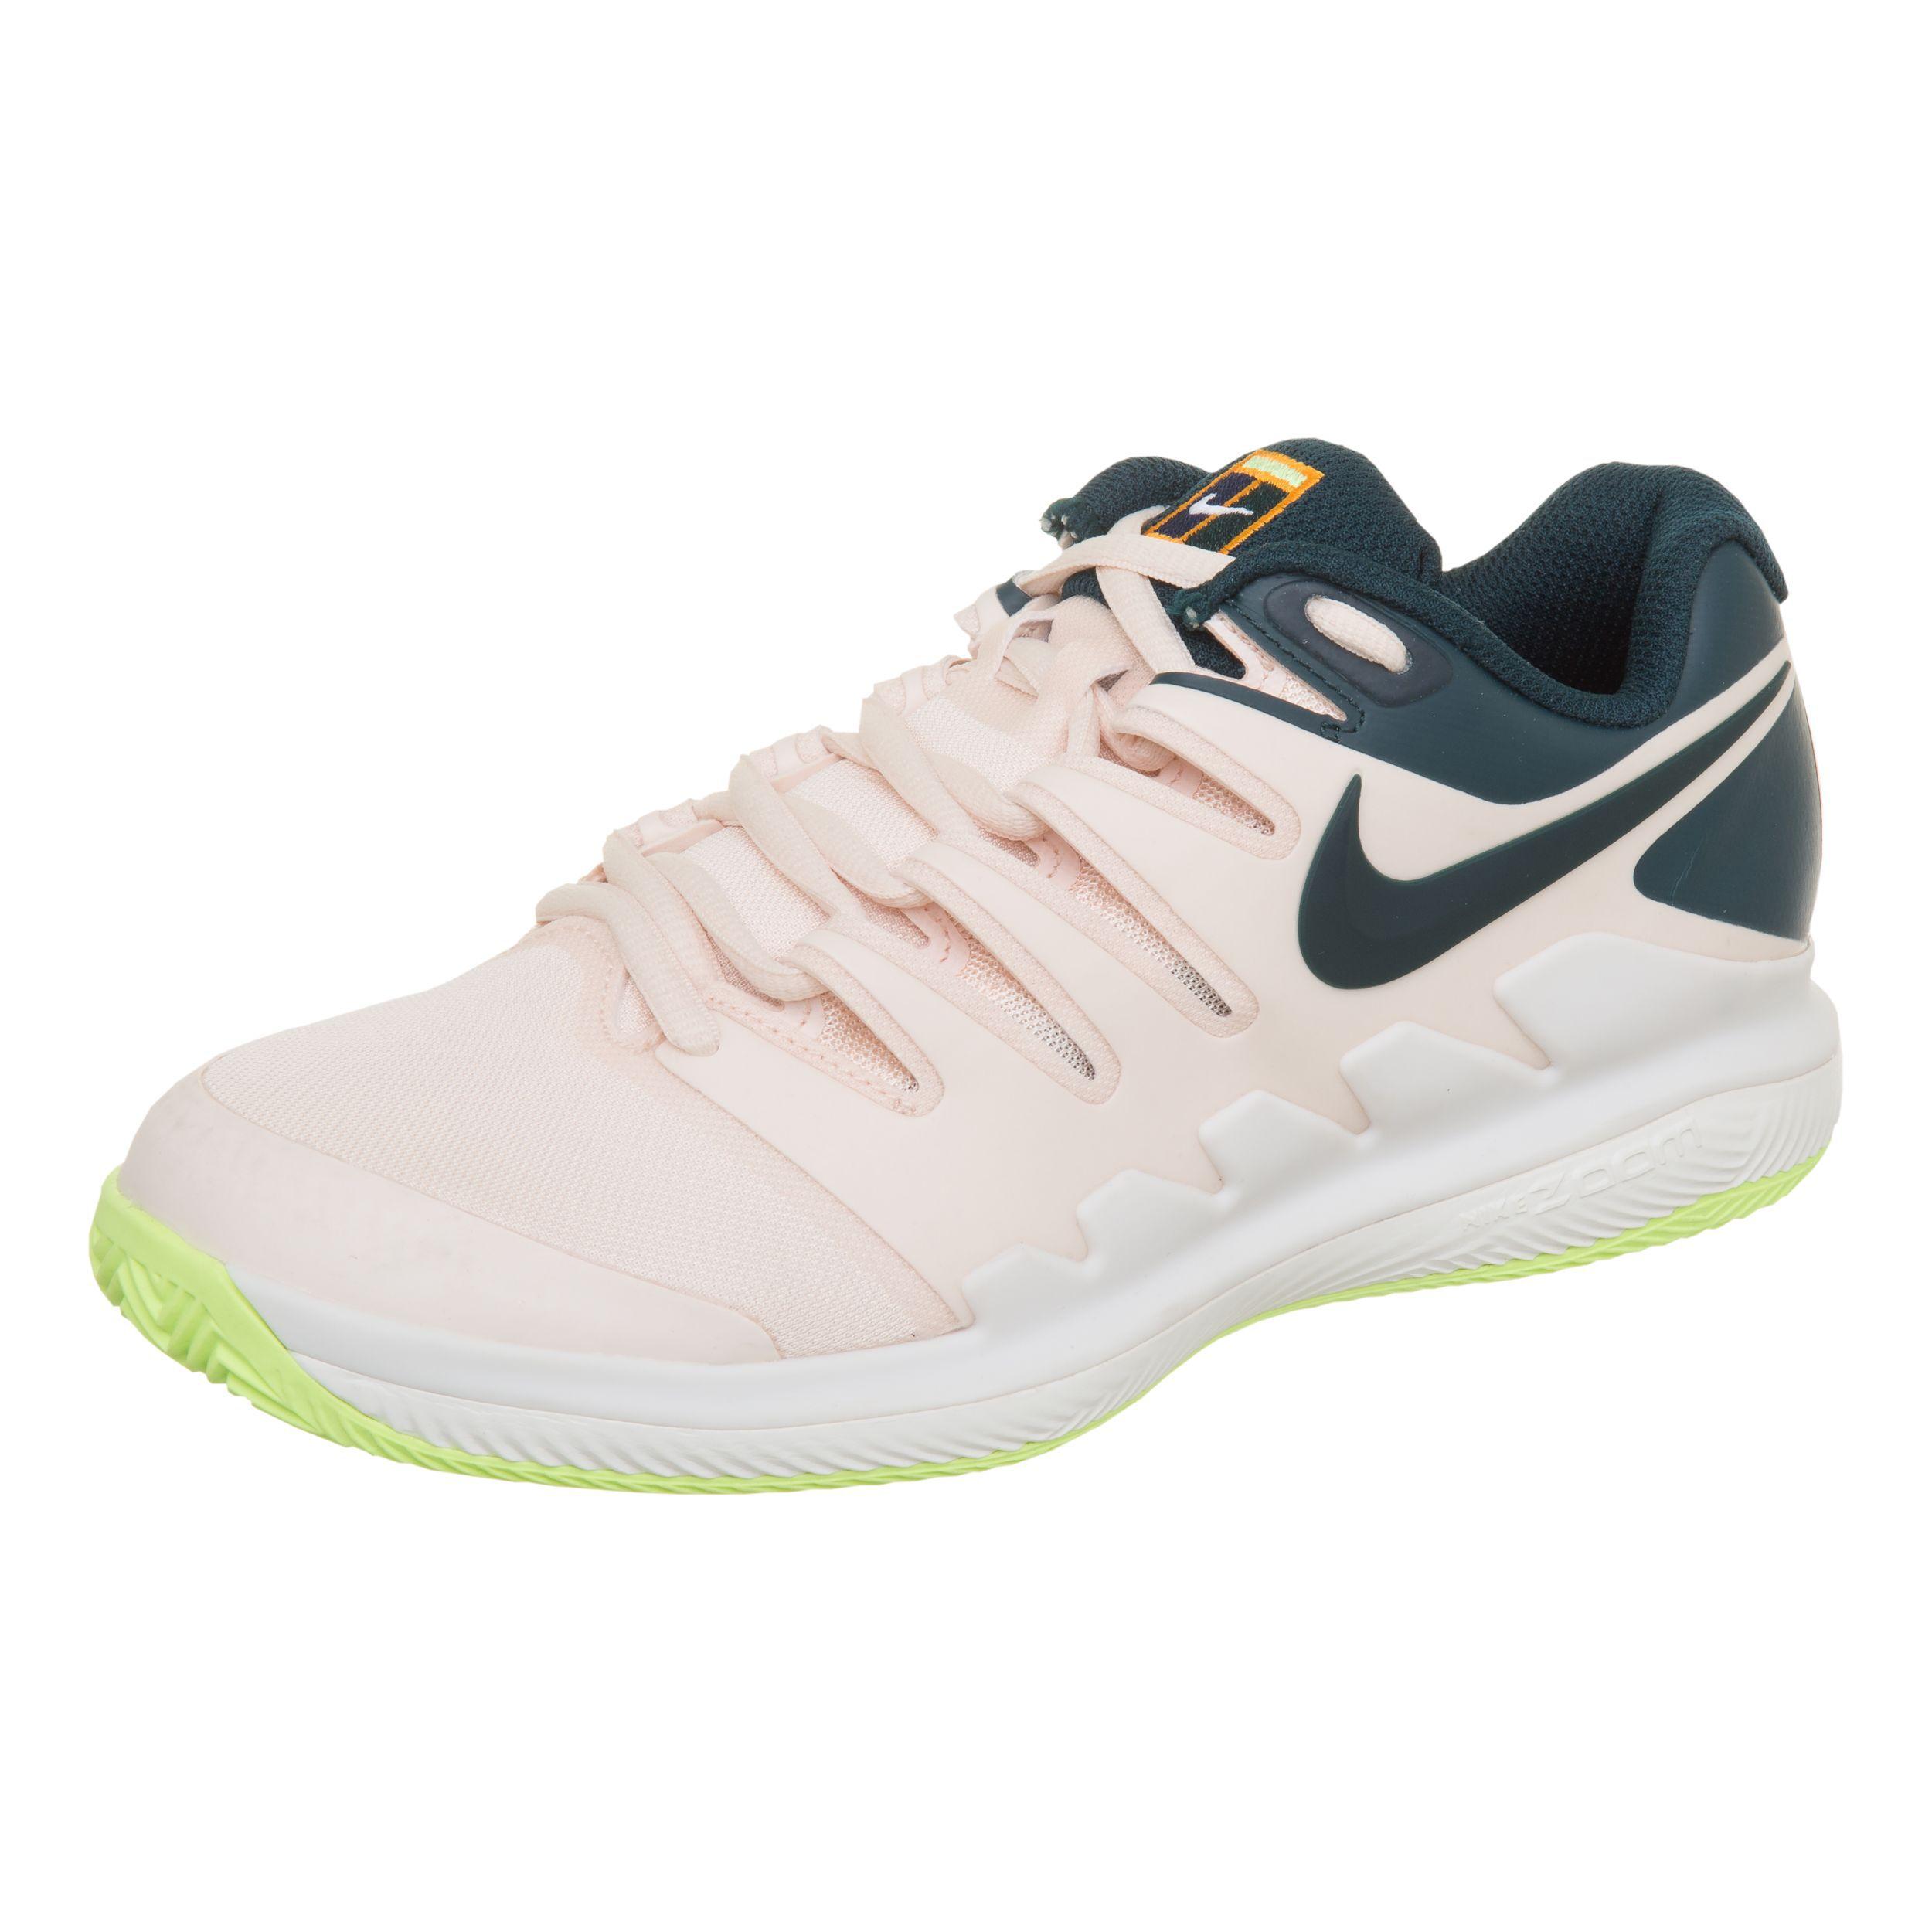 Nike Air Zoom Vapor X Clay Sandplatzschuh Damen Apricot